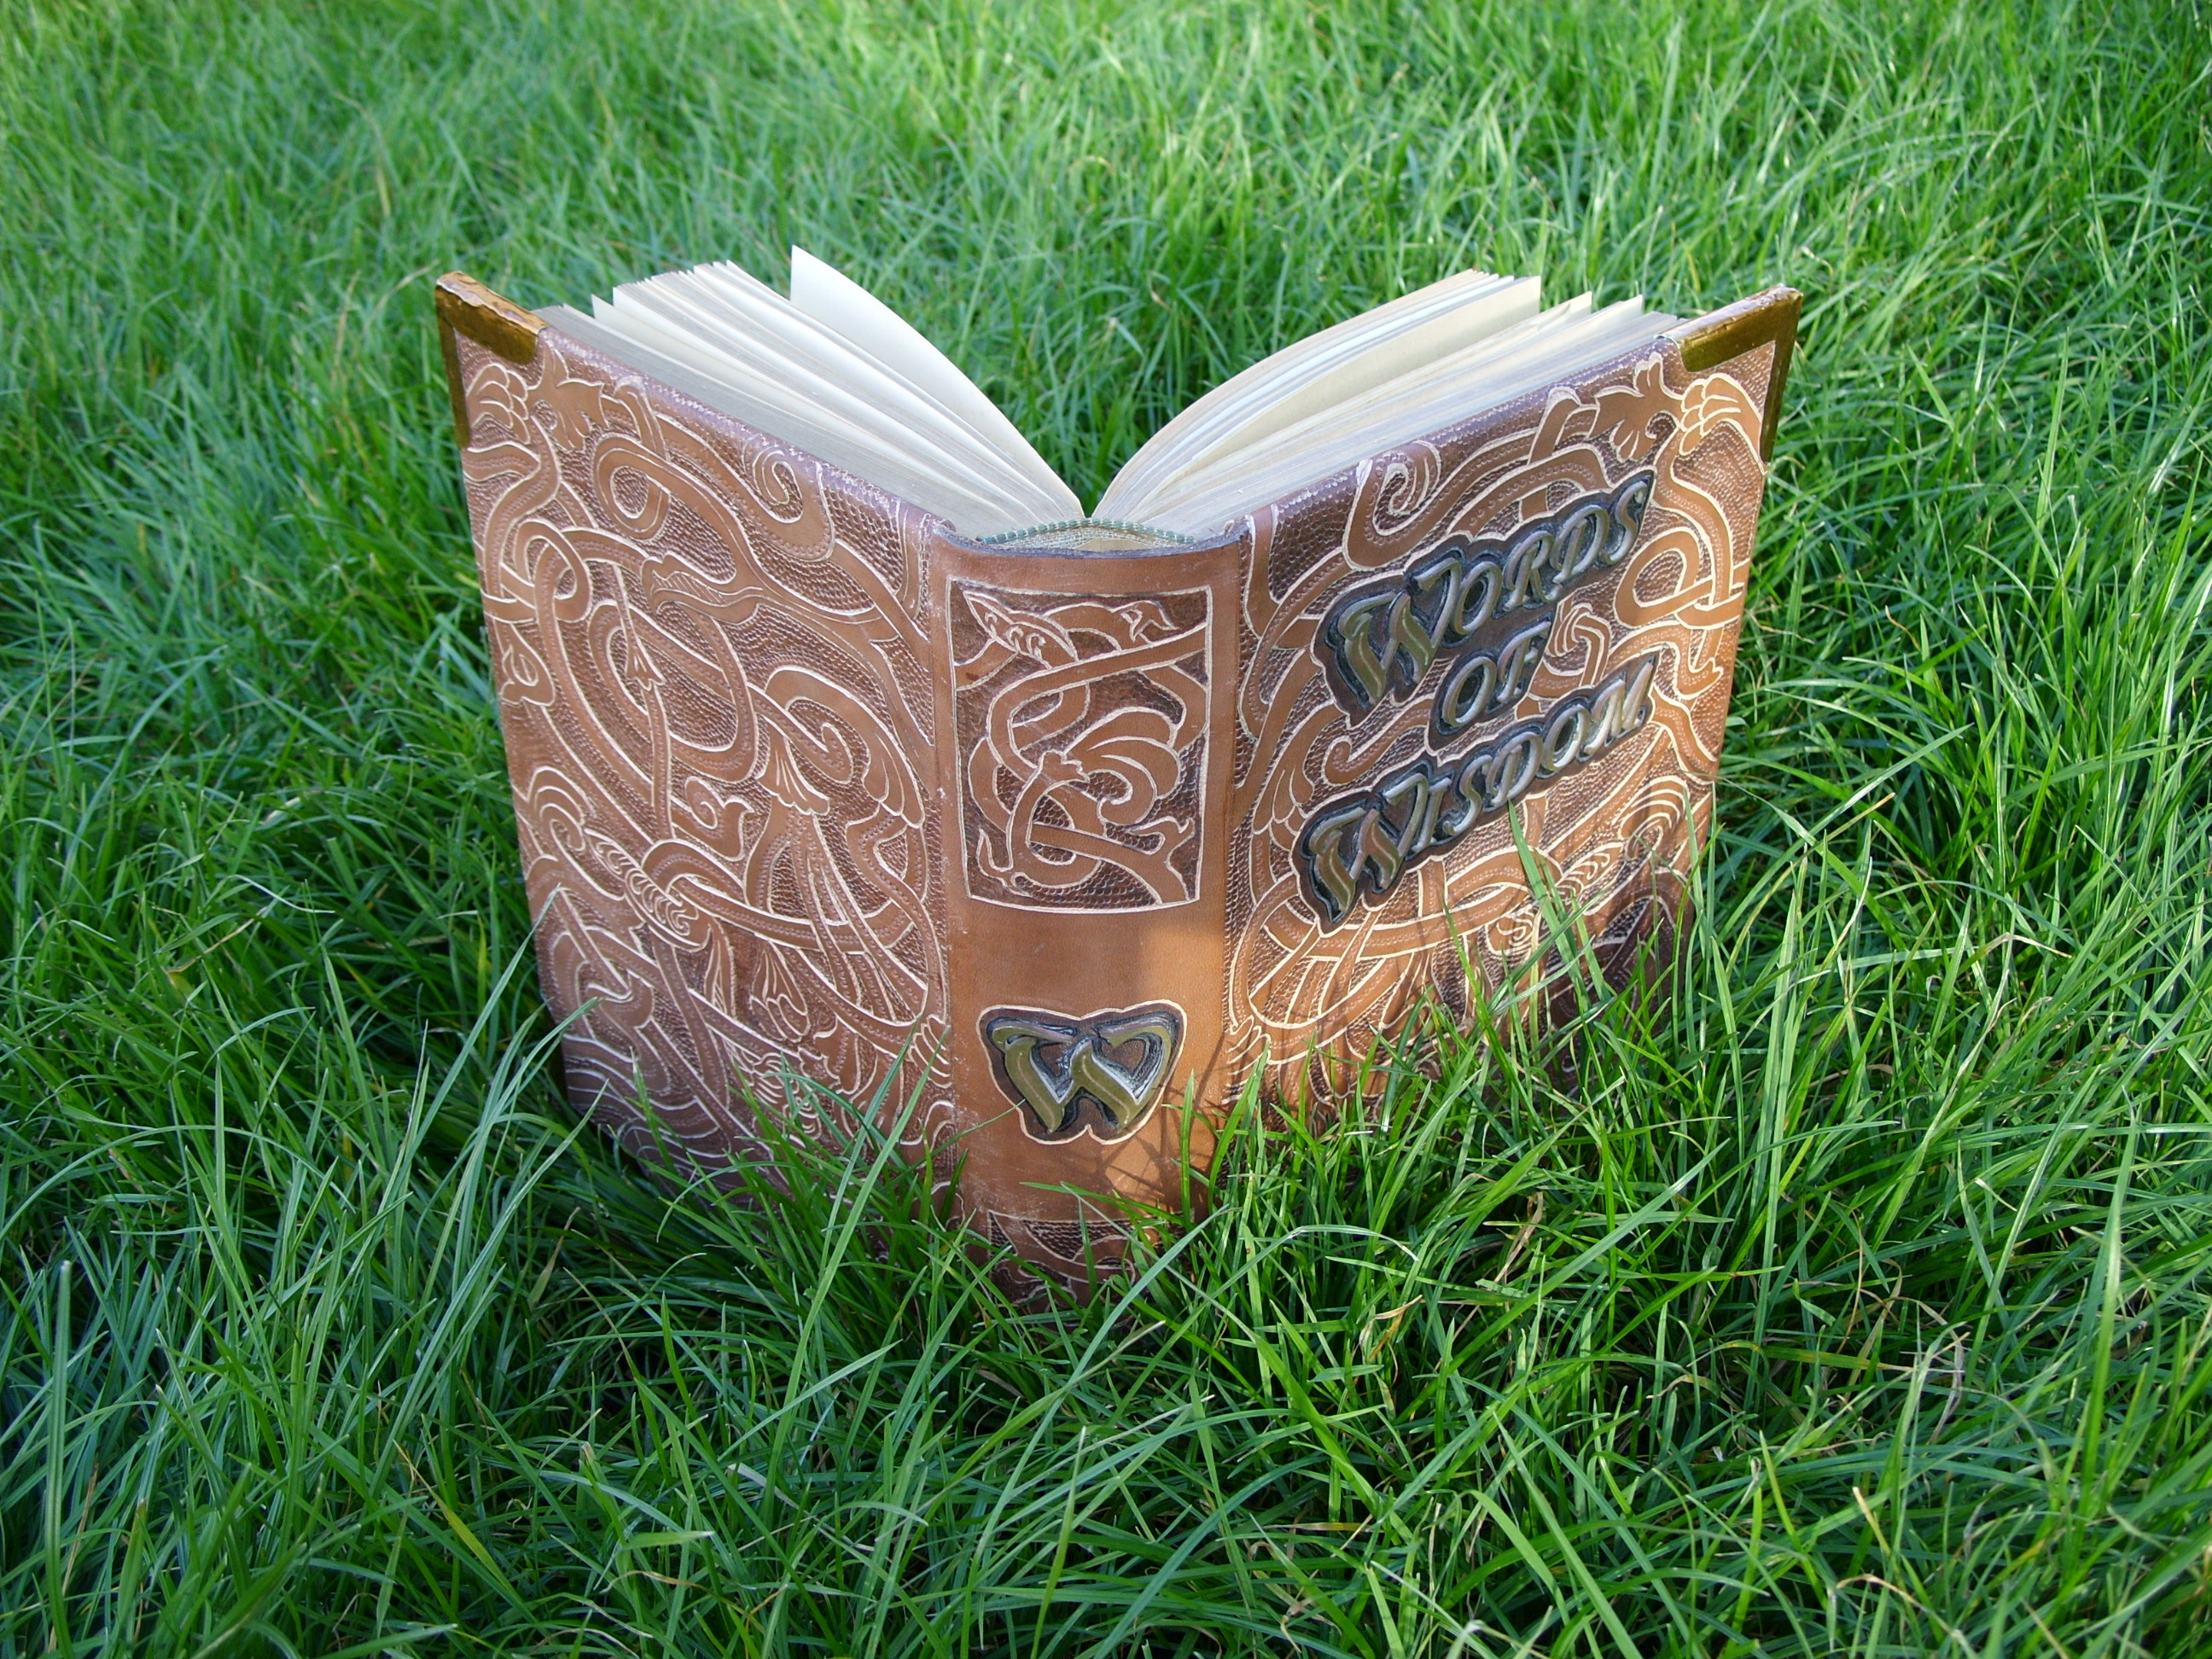 Filewords Of Wisdom Book Jpg